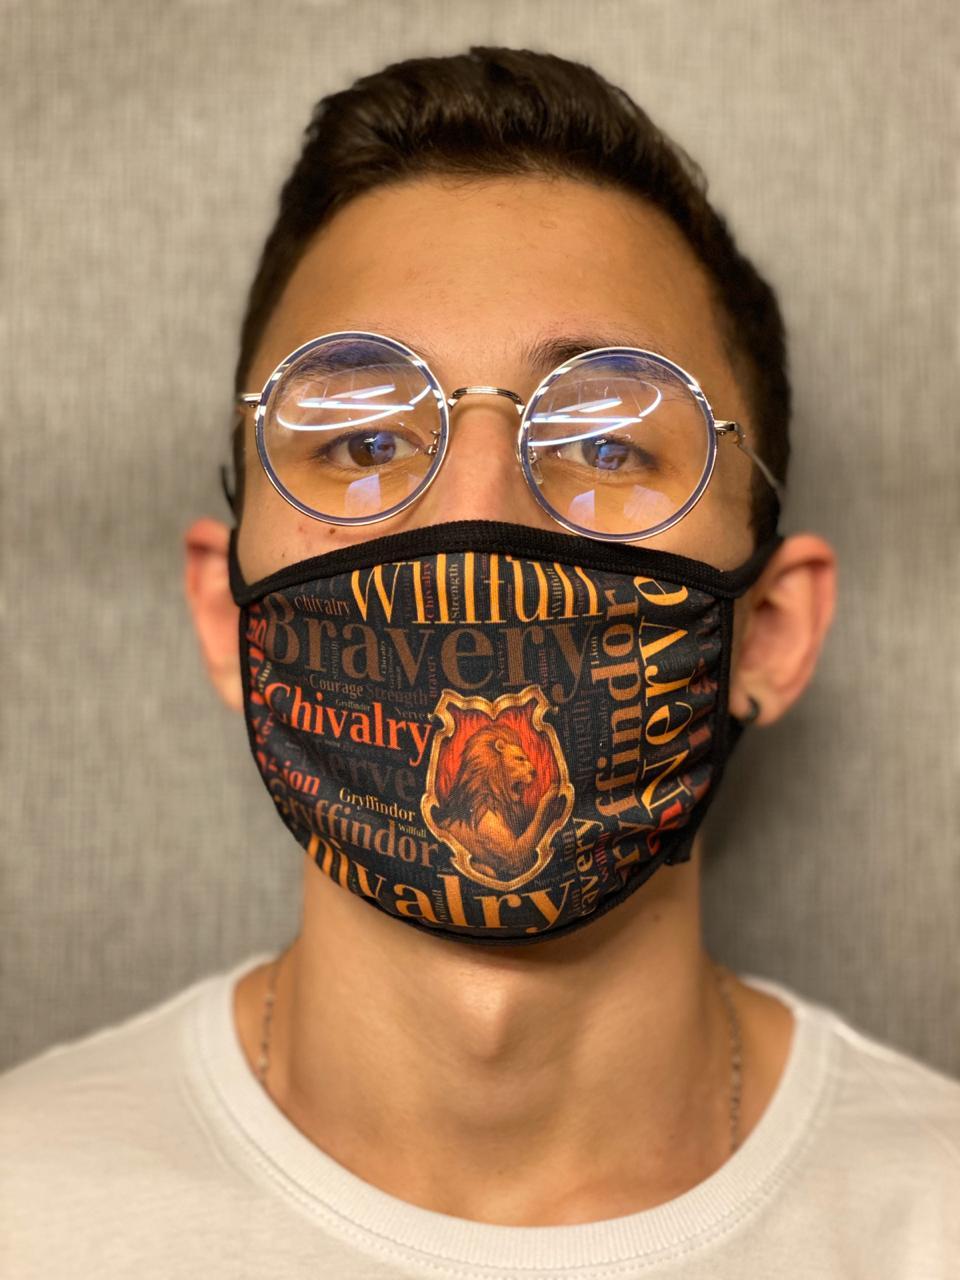 Máscara de Tecido Personalizada Time da Escola de Magia Lavável Reutilizável - EV